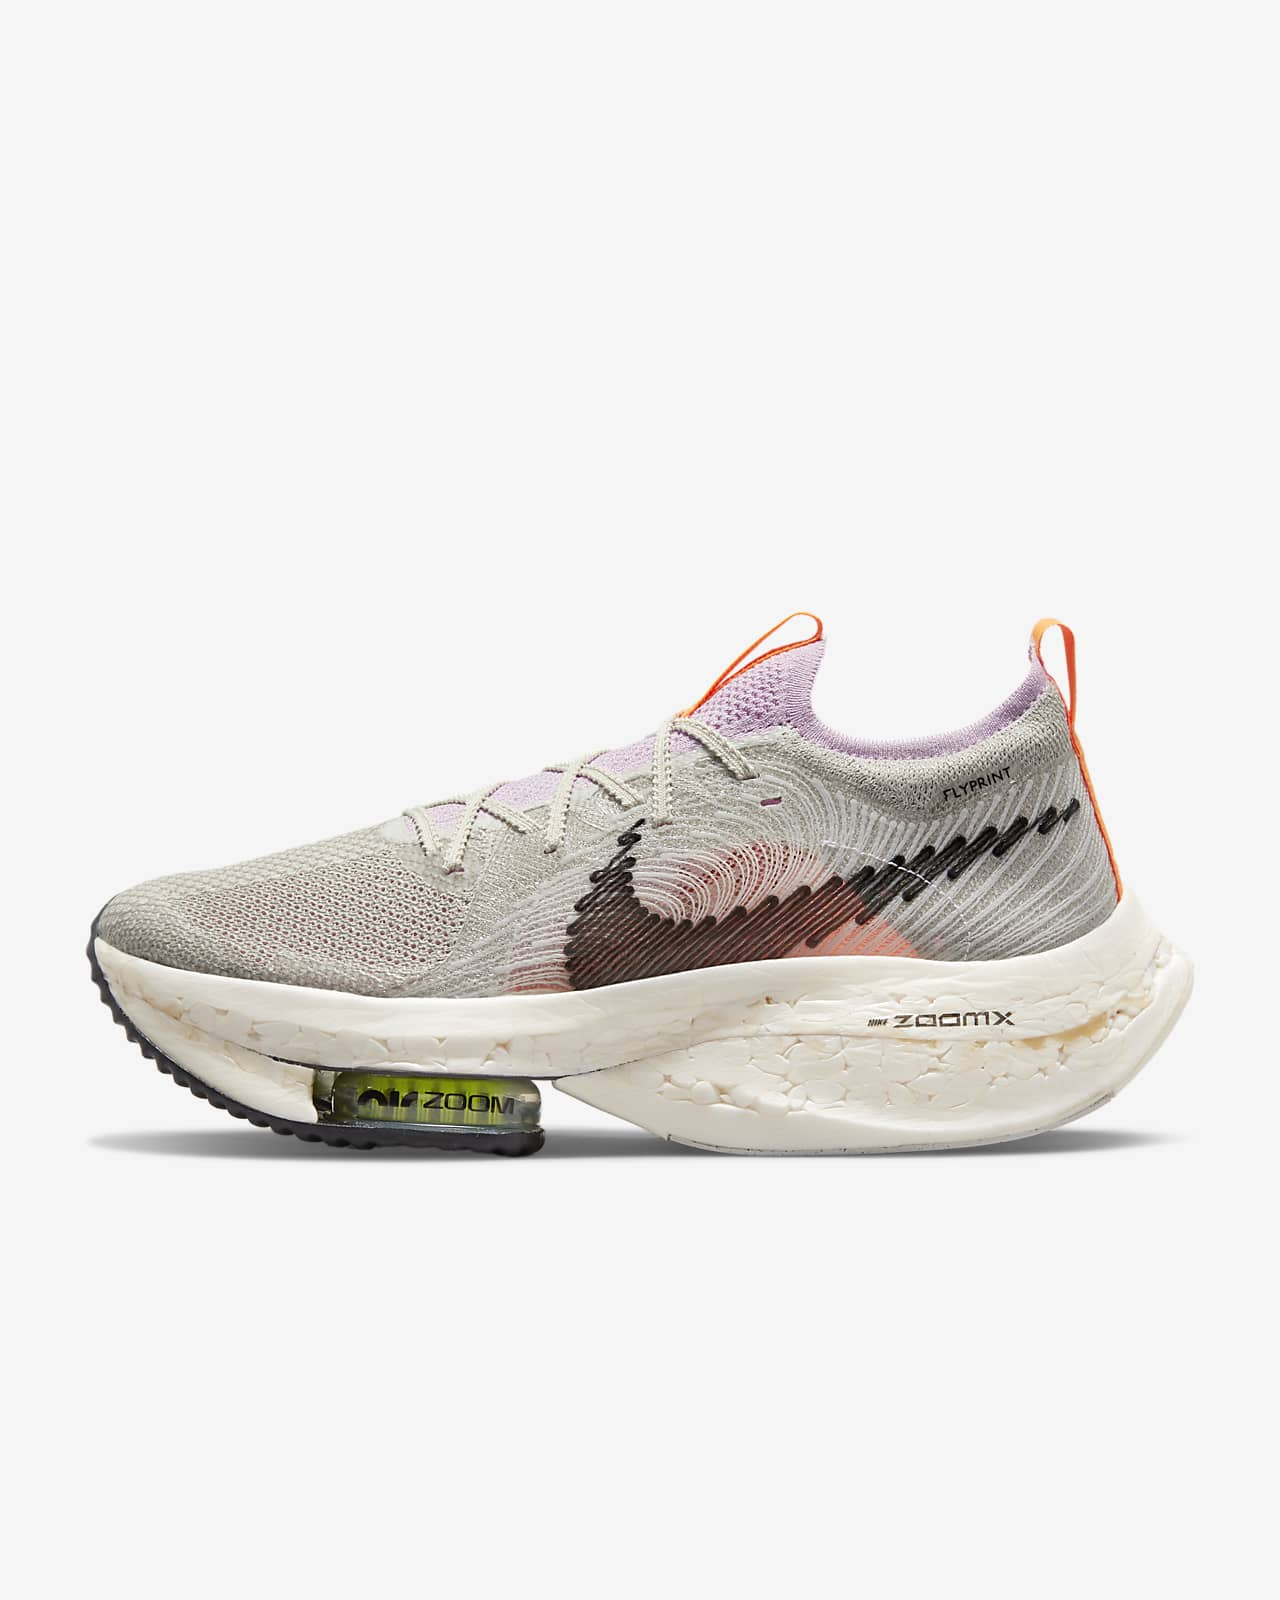 Nike Zoom Alphafly Next Nature Zapatillas de competición para carretera